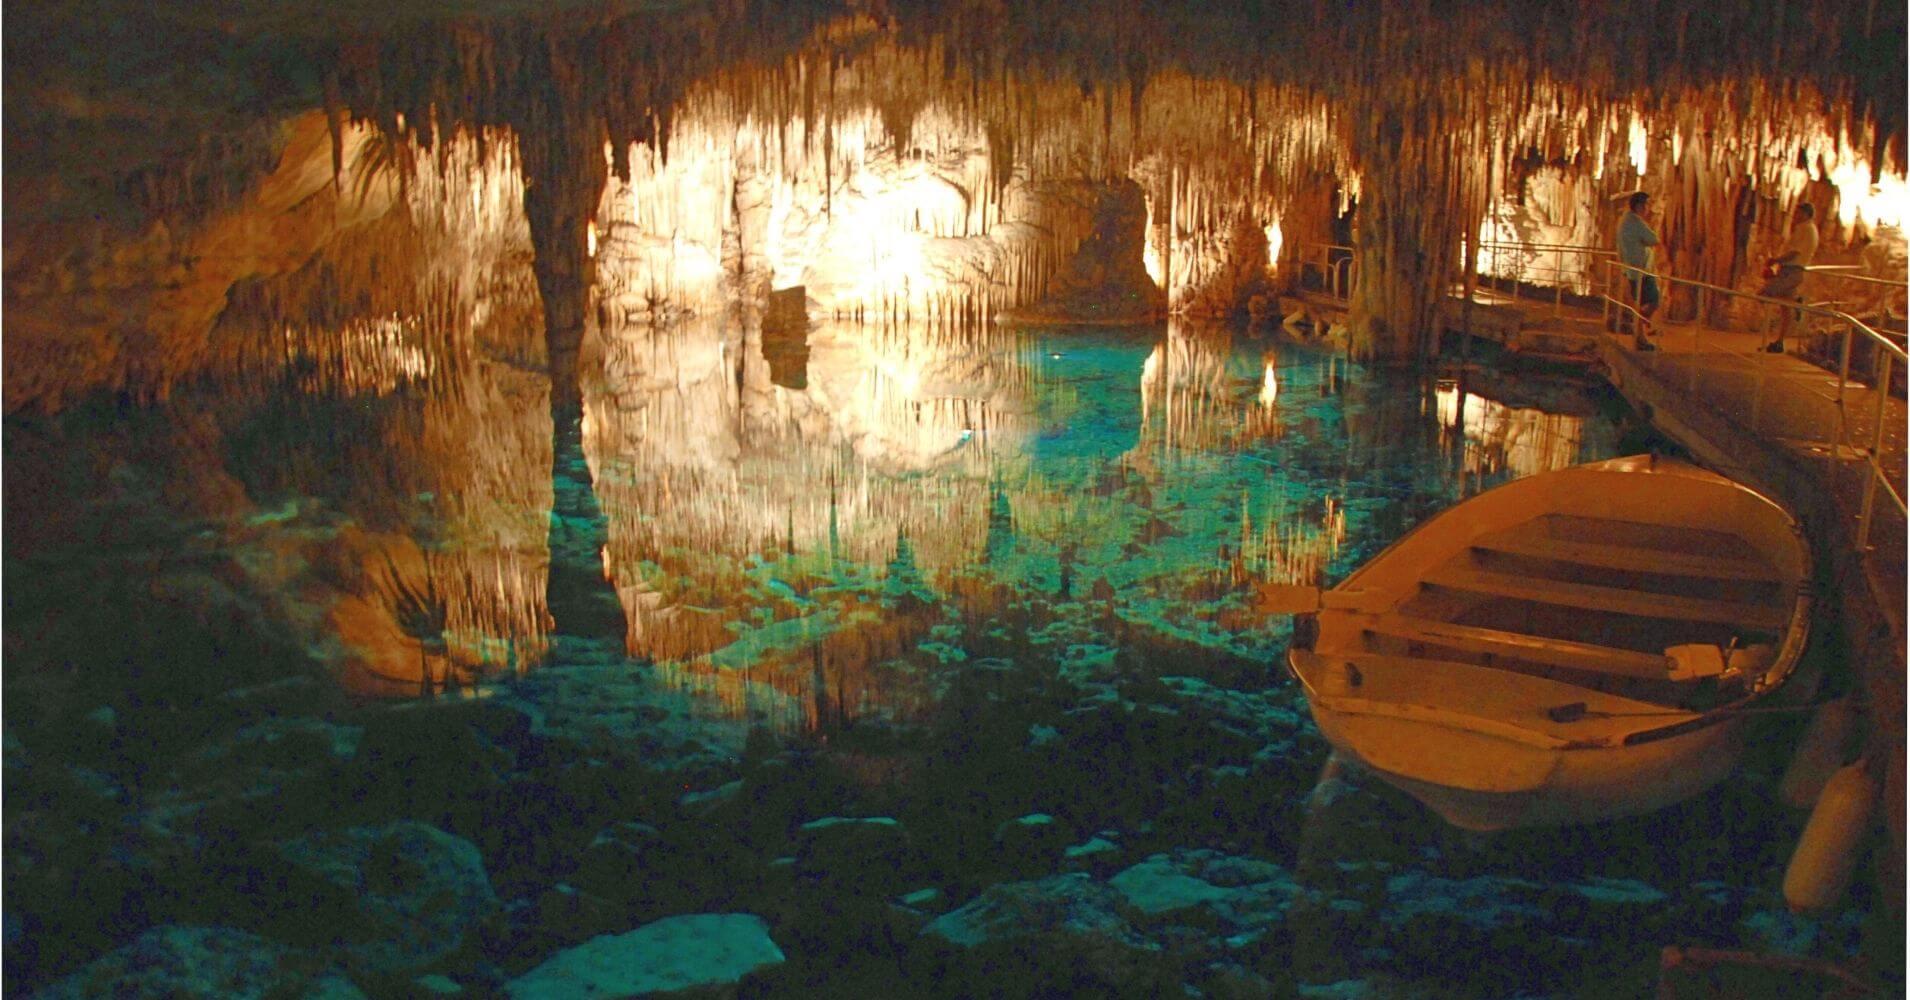 Cuevas del Drach. Porto Cristo. Palma de Mallorca. Islas Baleares. España.